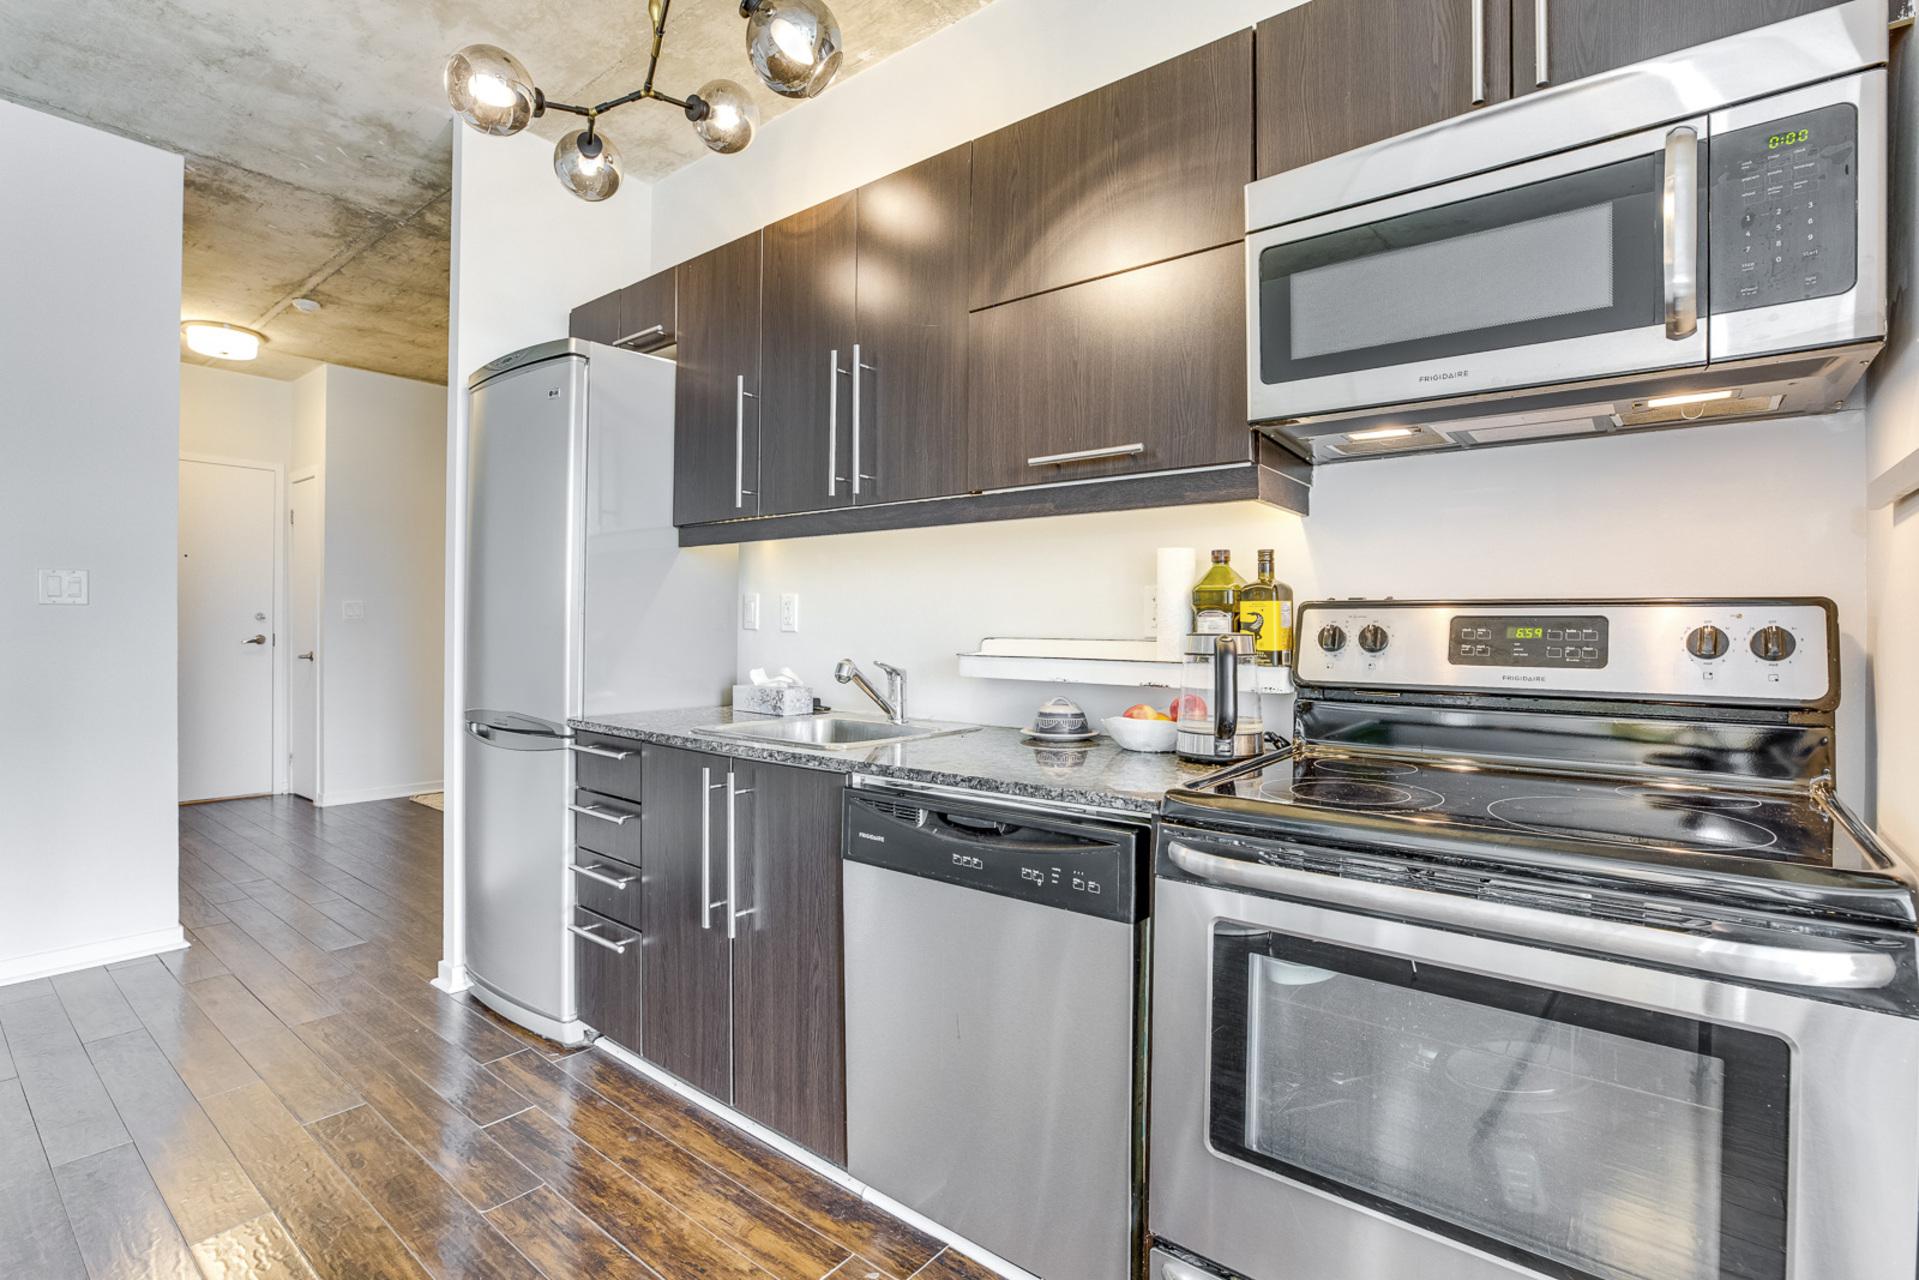 Kitchen - 1512-150 Sudbury St, Toronto - Elite3 & Team at 1512 - 150 Sudbury Street, Little Portugal, Toronto